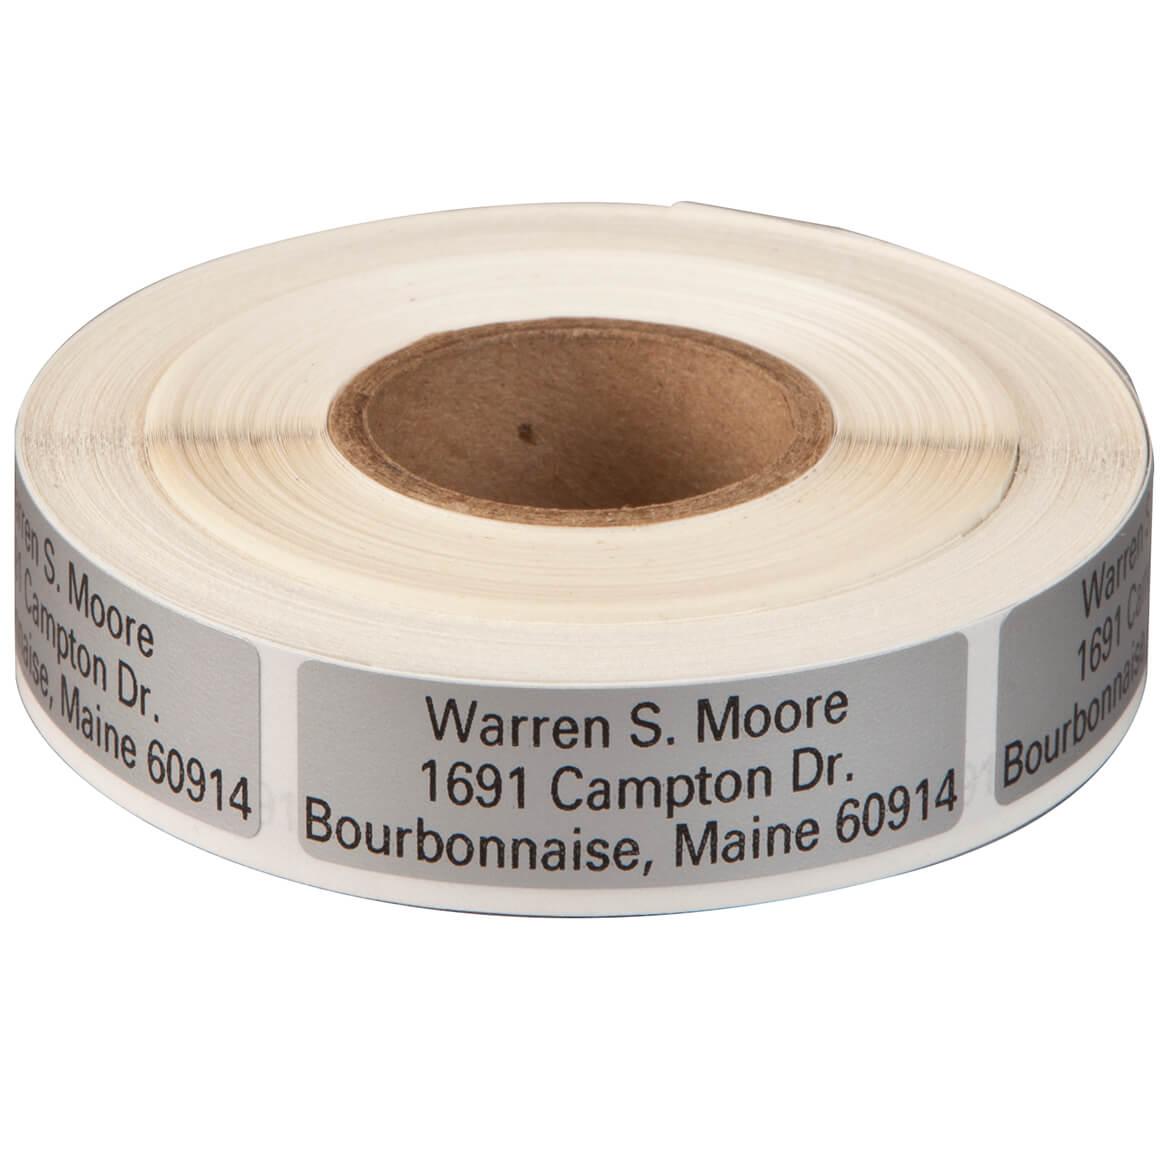 Large Print Self-Stick Address Labels, Roll of 500-350736